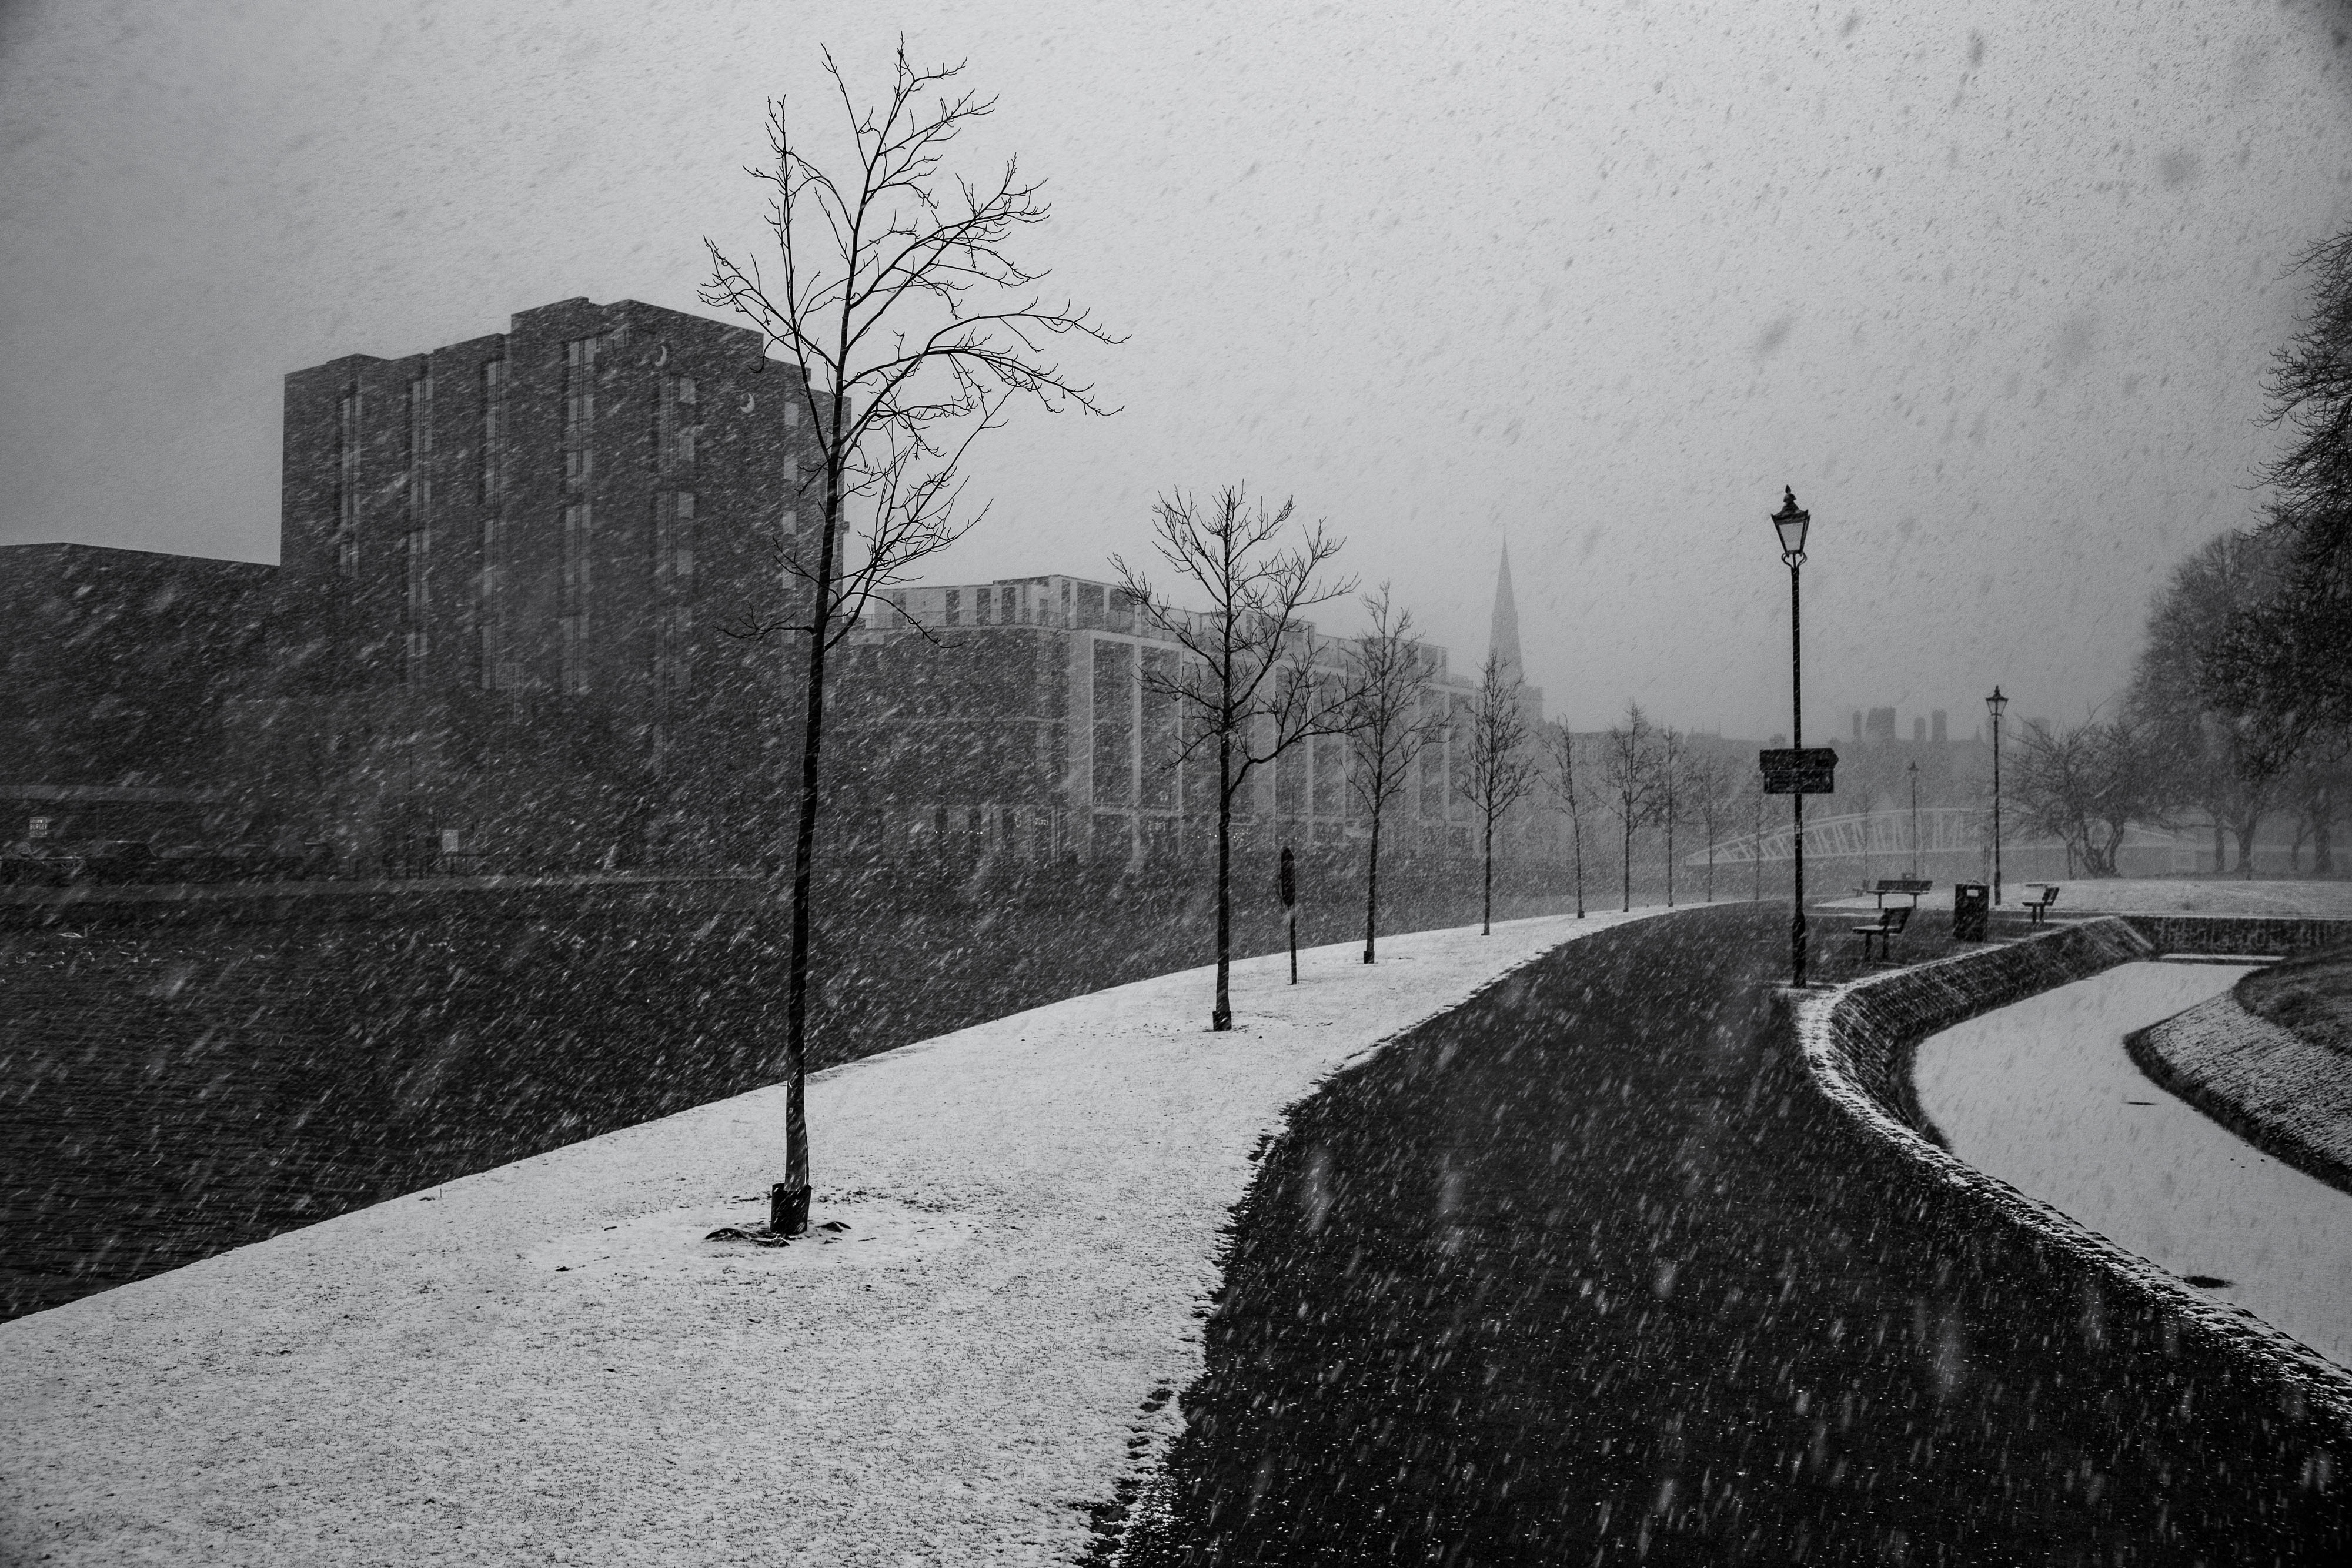 Slightly Snowy by Mincingyoda